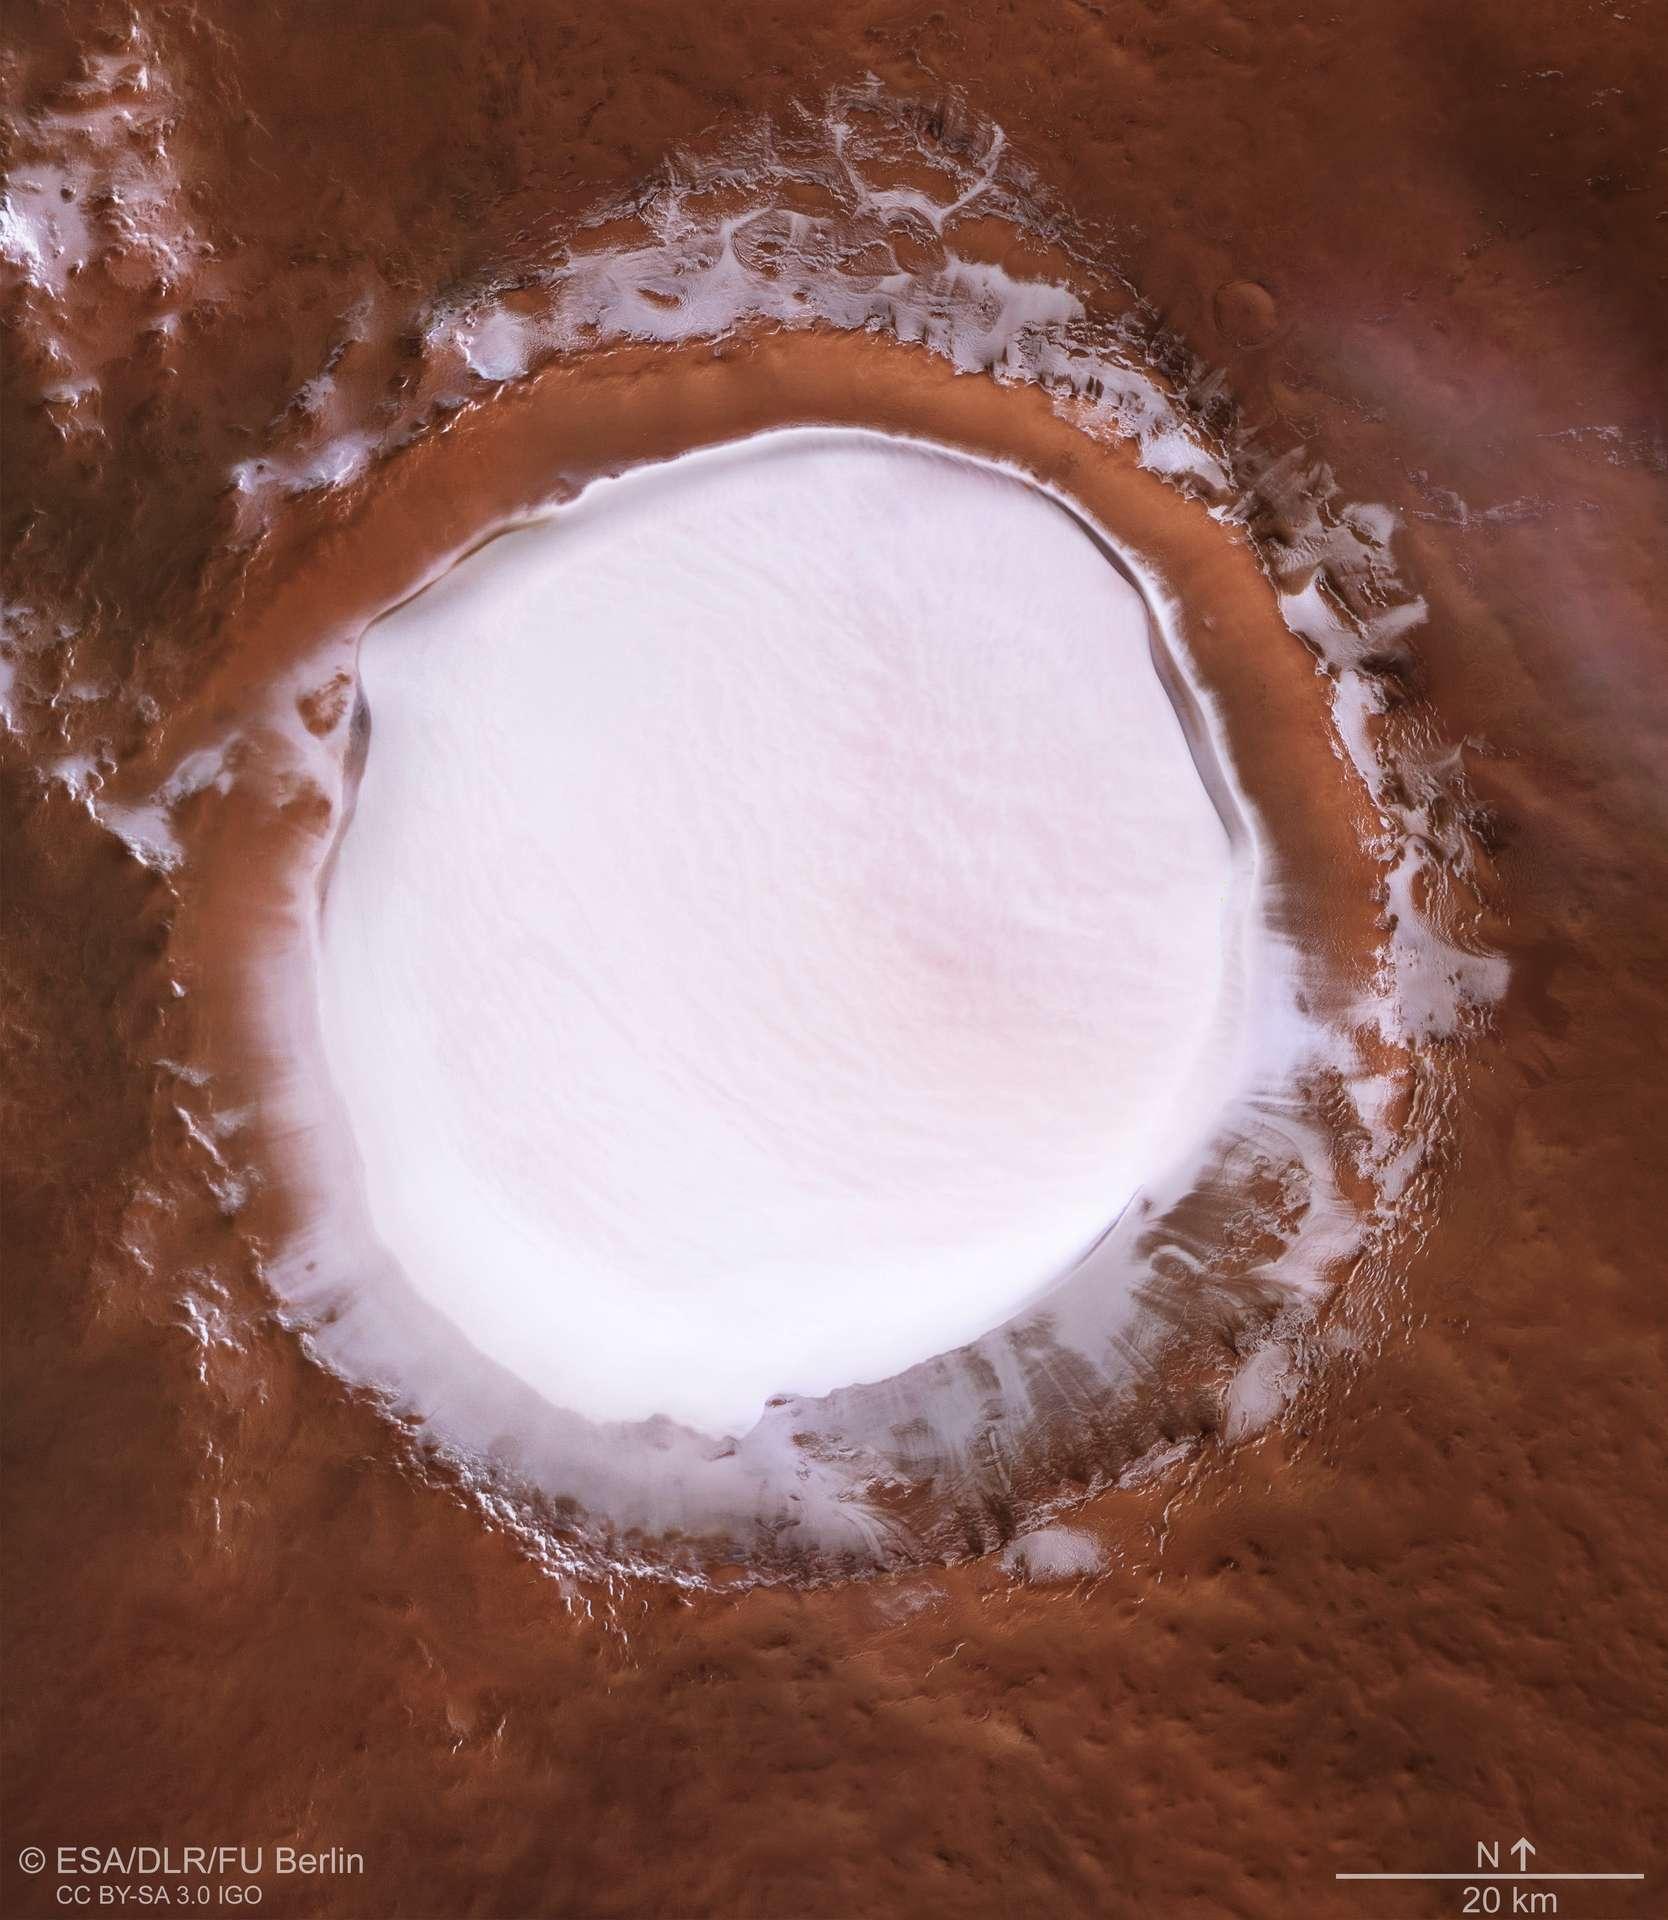 Le cratère Korolev photographié par la sonde Mars Express. © ESA, DLR, FU Berlin, CC by-sa 3.0 IGO